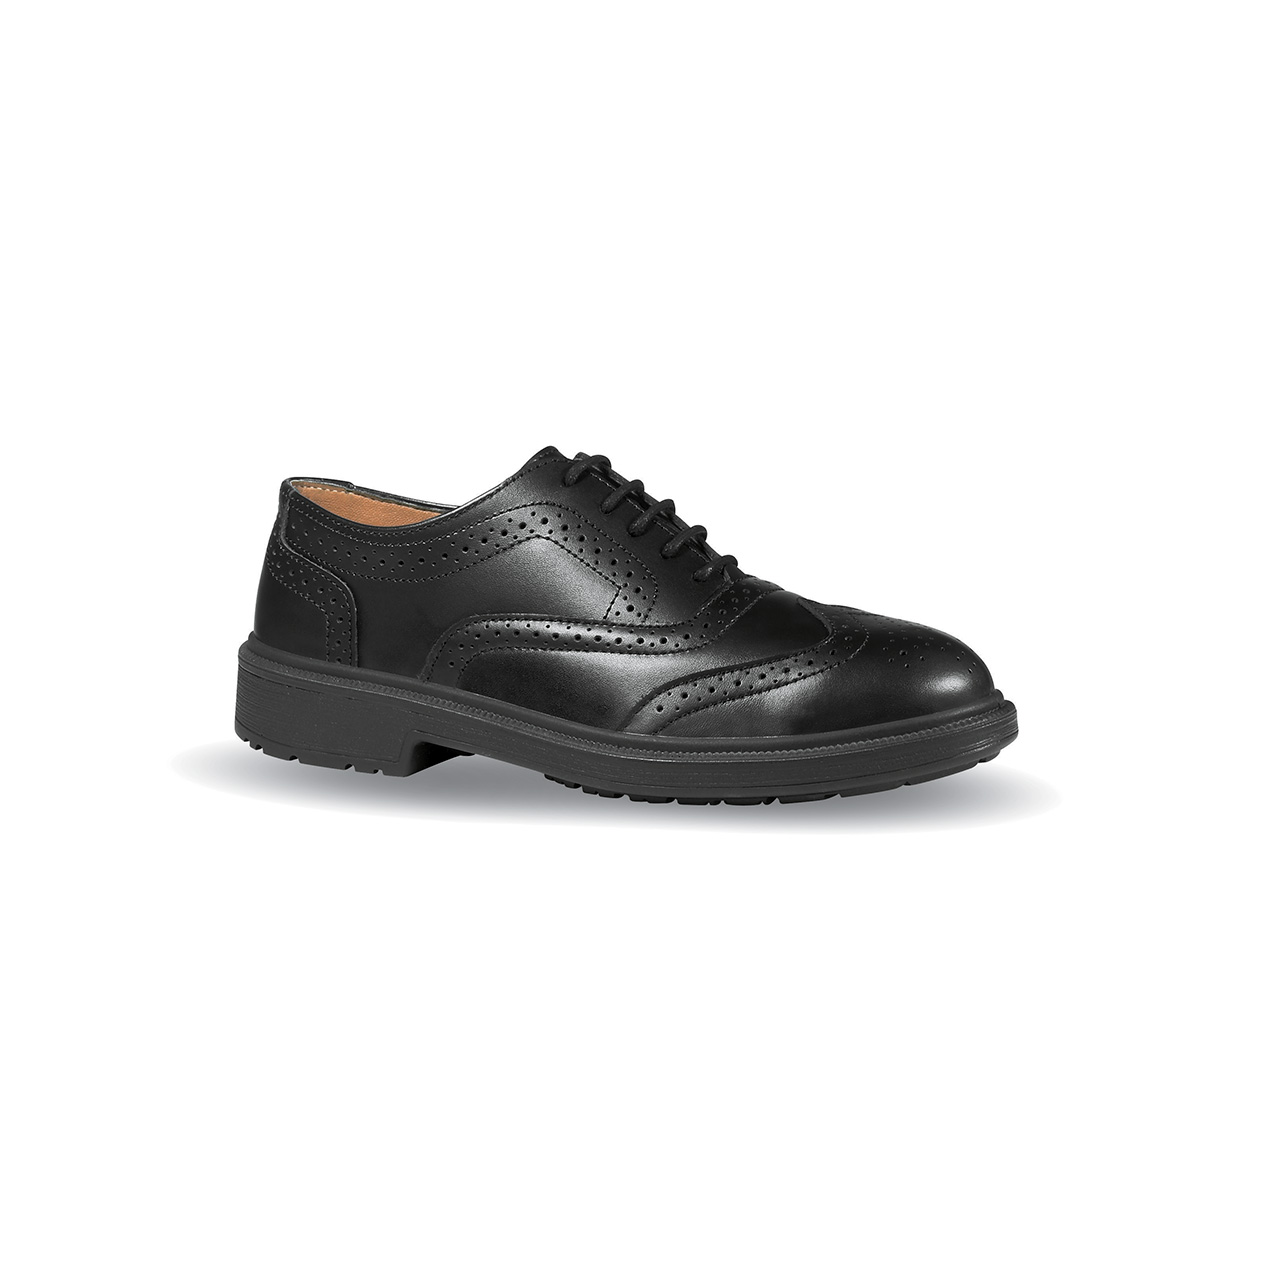 scarpa antinfortunistica upower modello venicemanager linea U MANAGER vista laterale